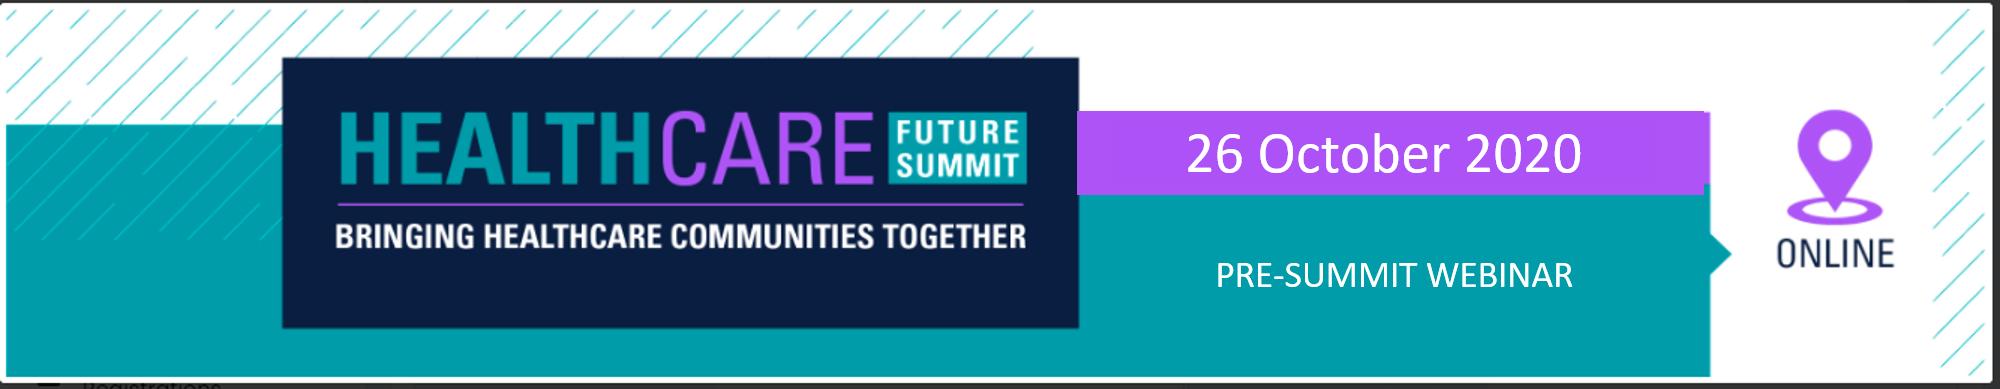 Healthcare Future Summit (OCT 26, 2020)